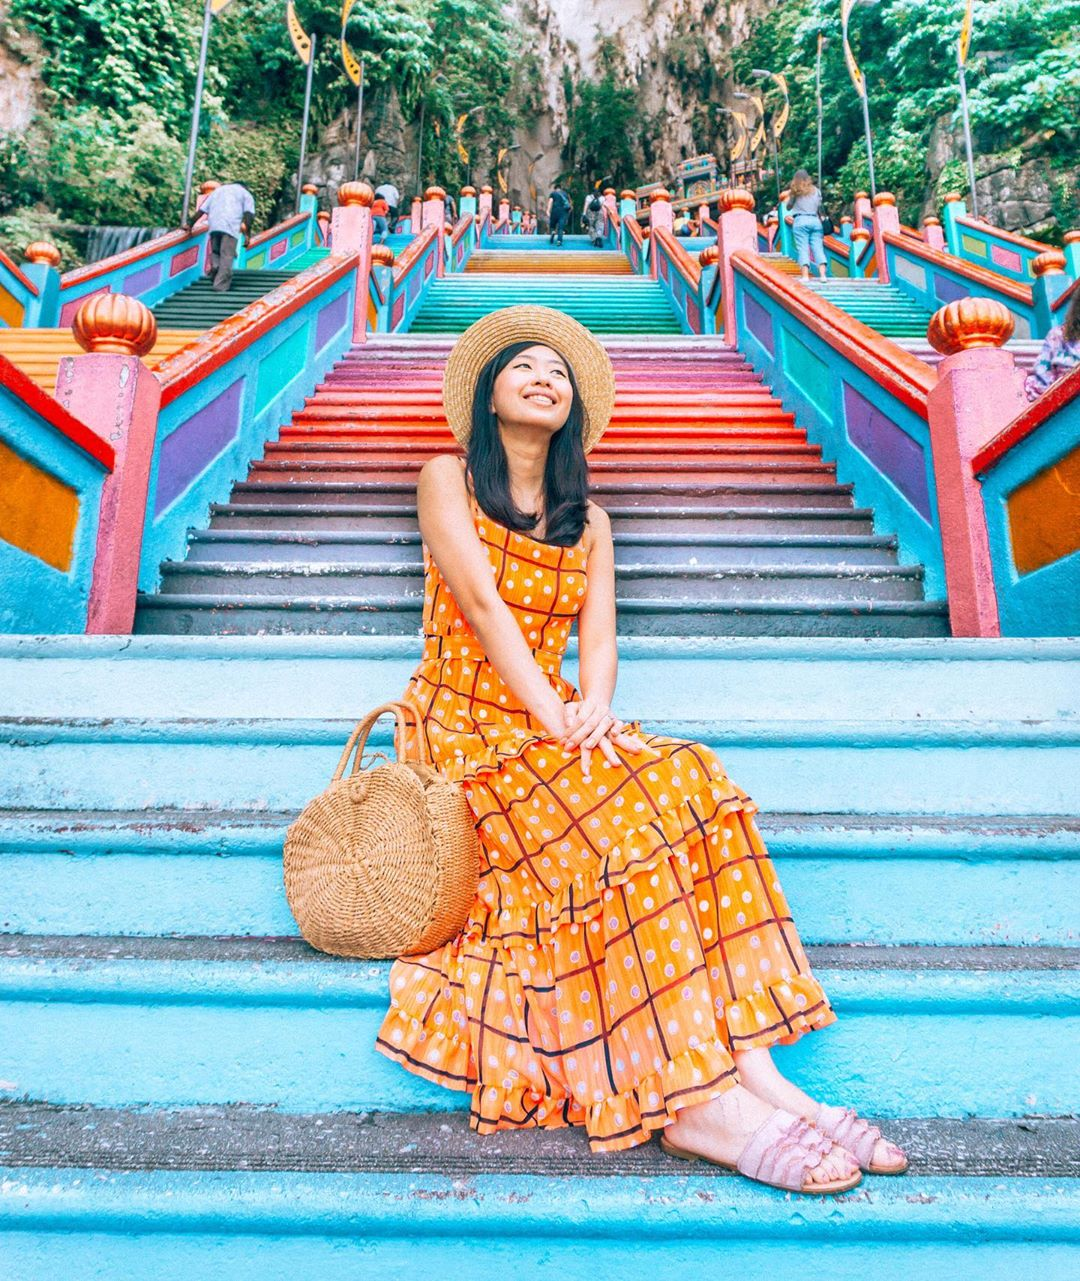 malaysia_dong-batu-malaysia-14